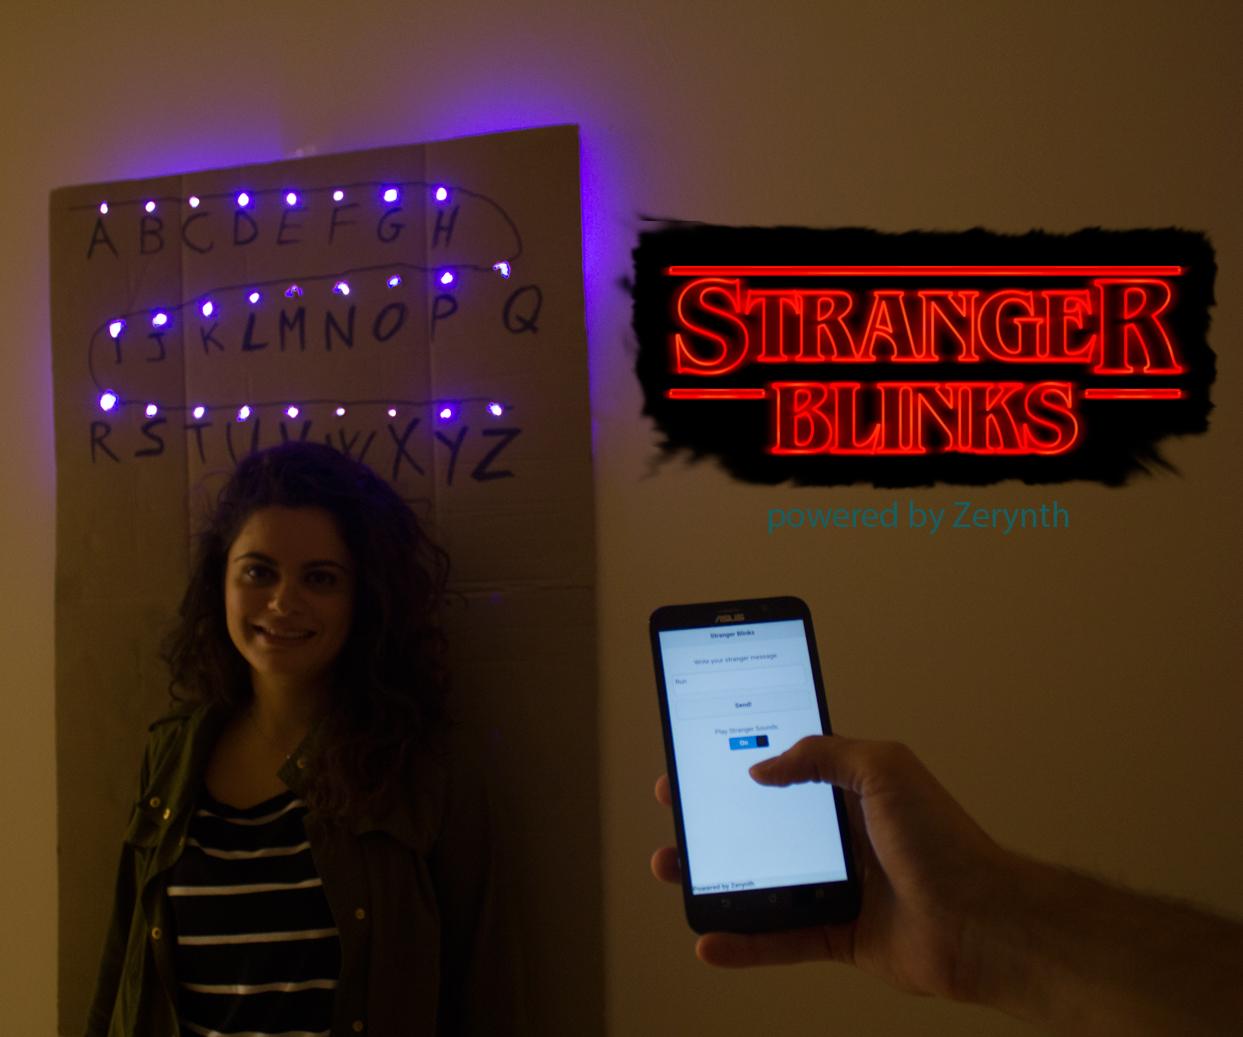 Stranger Blinks: a last-minute interactive Halloween costume inspired by Stranger Things